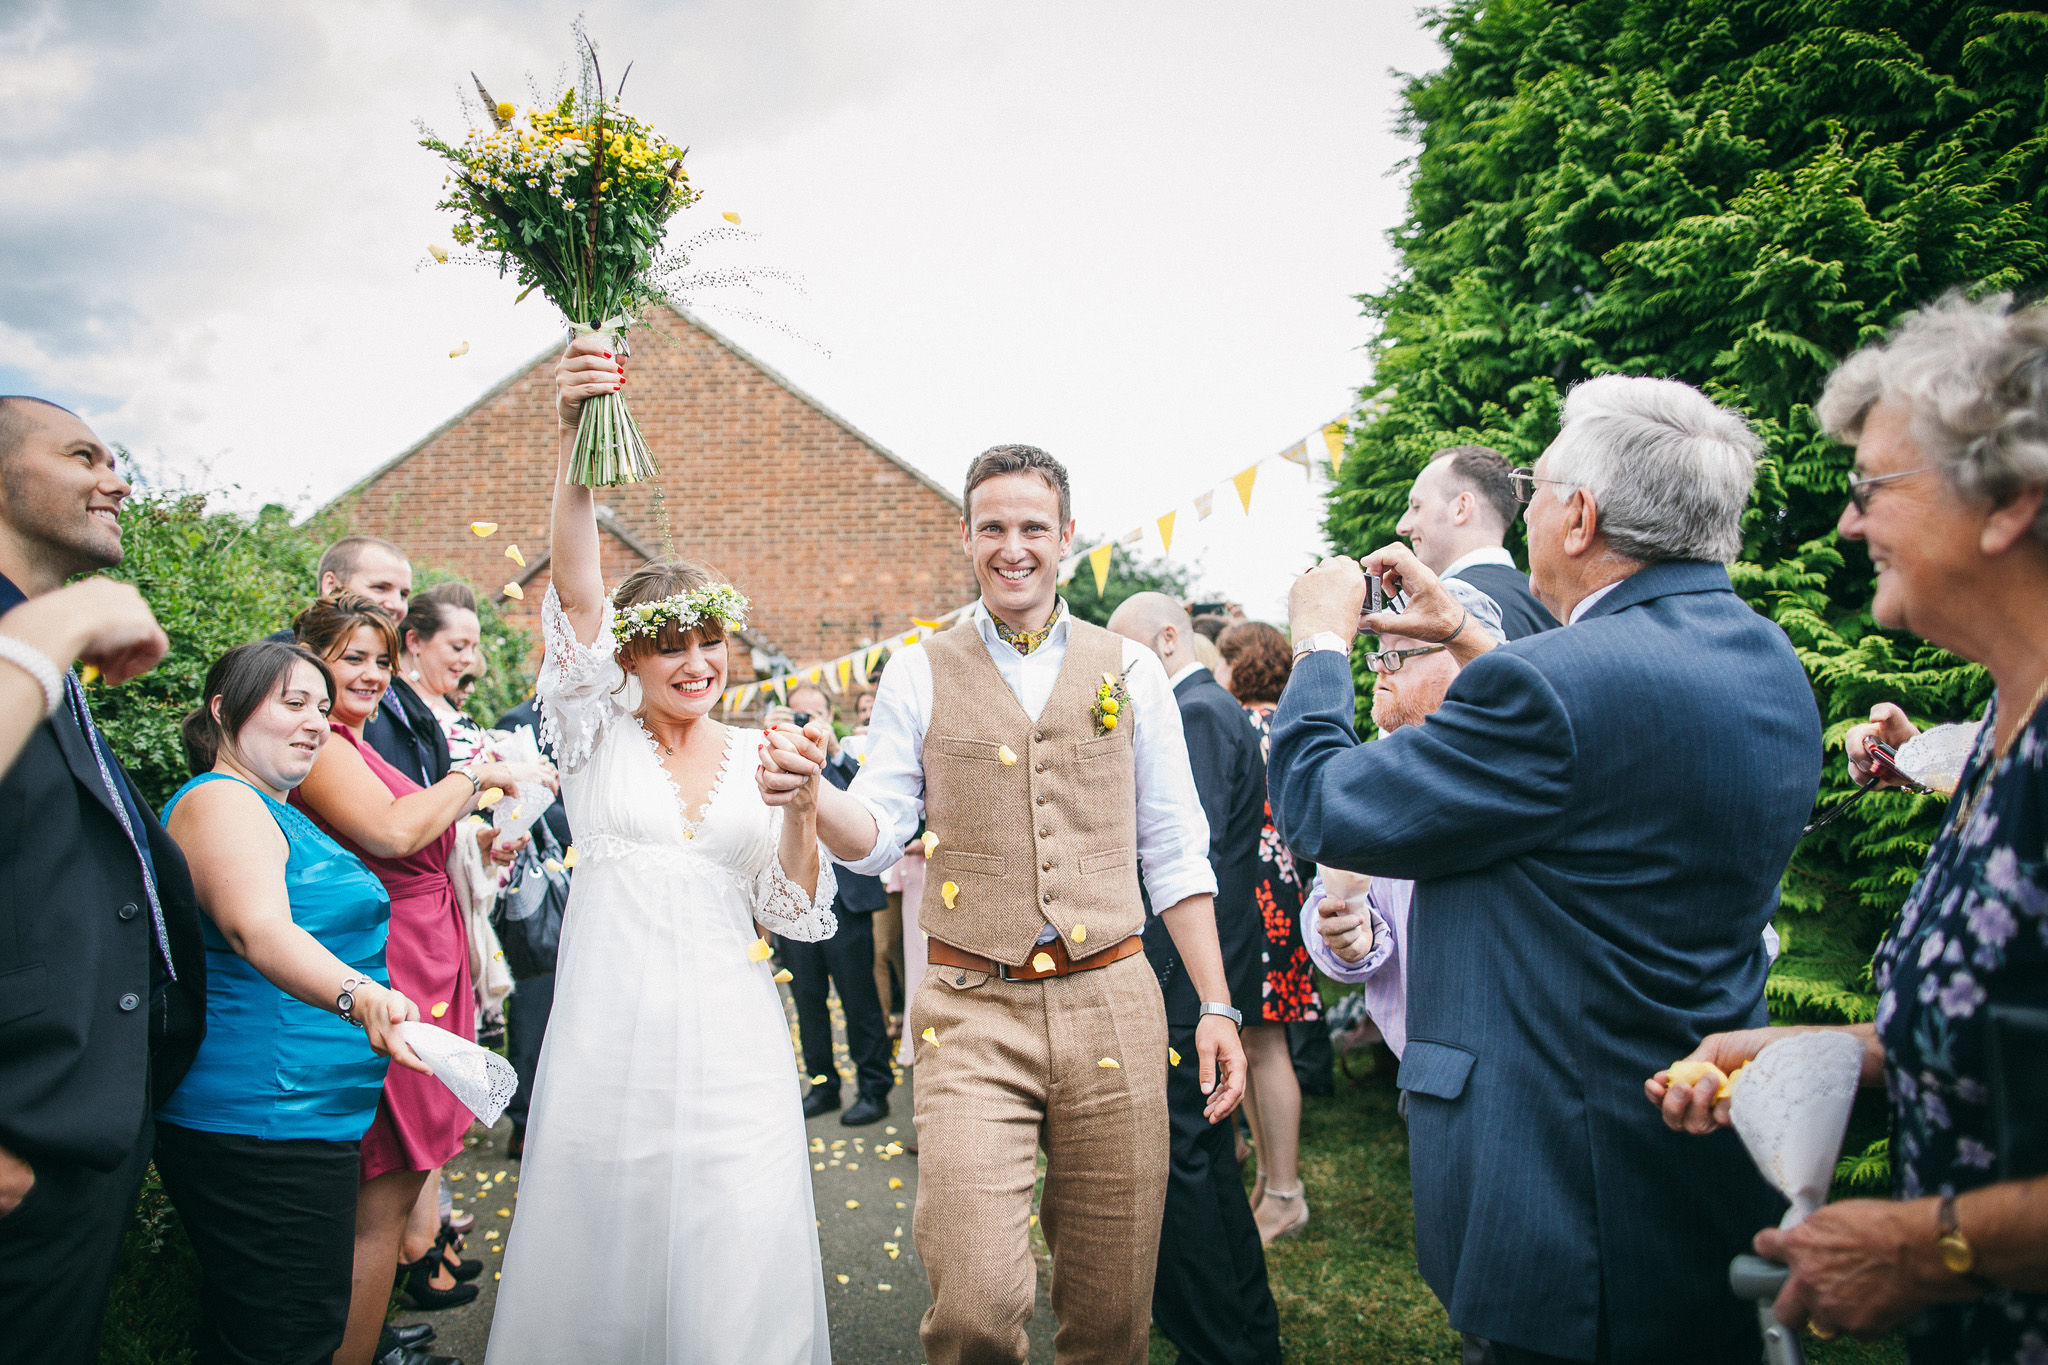 chantry_sussex_barn_wedding_323.jpg